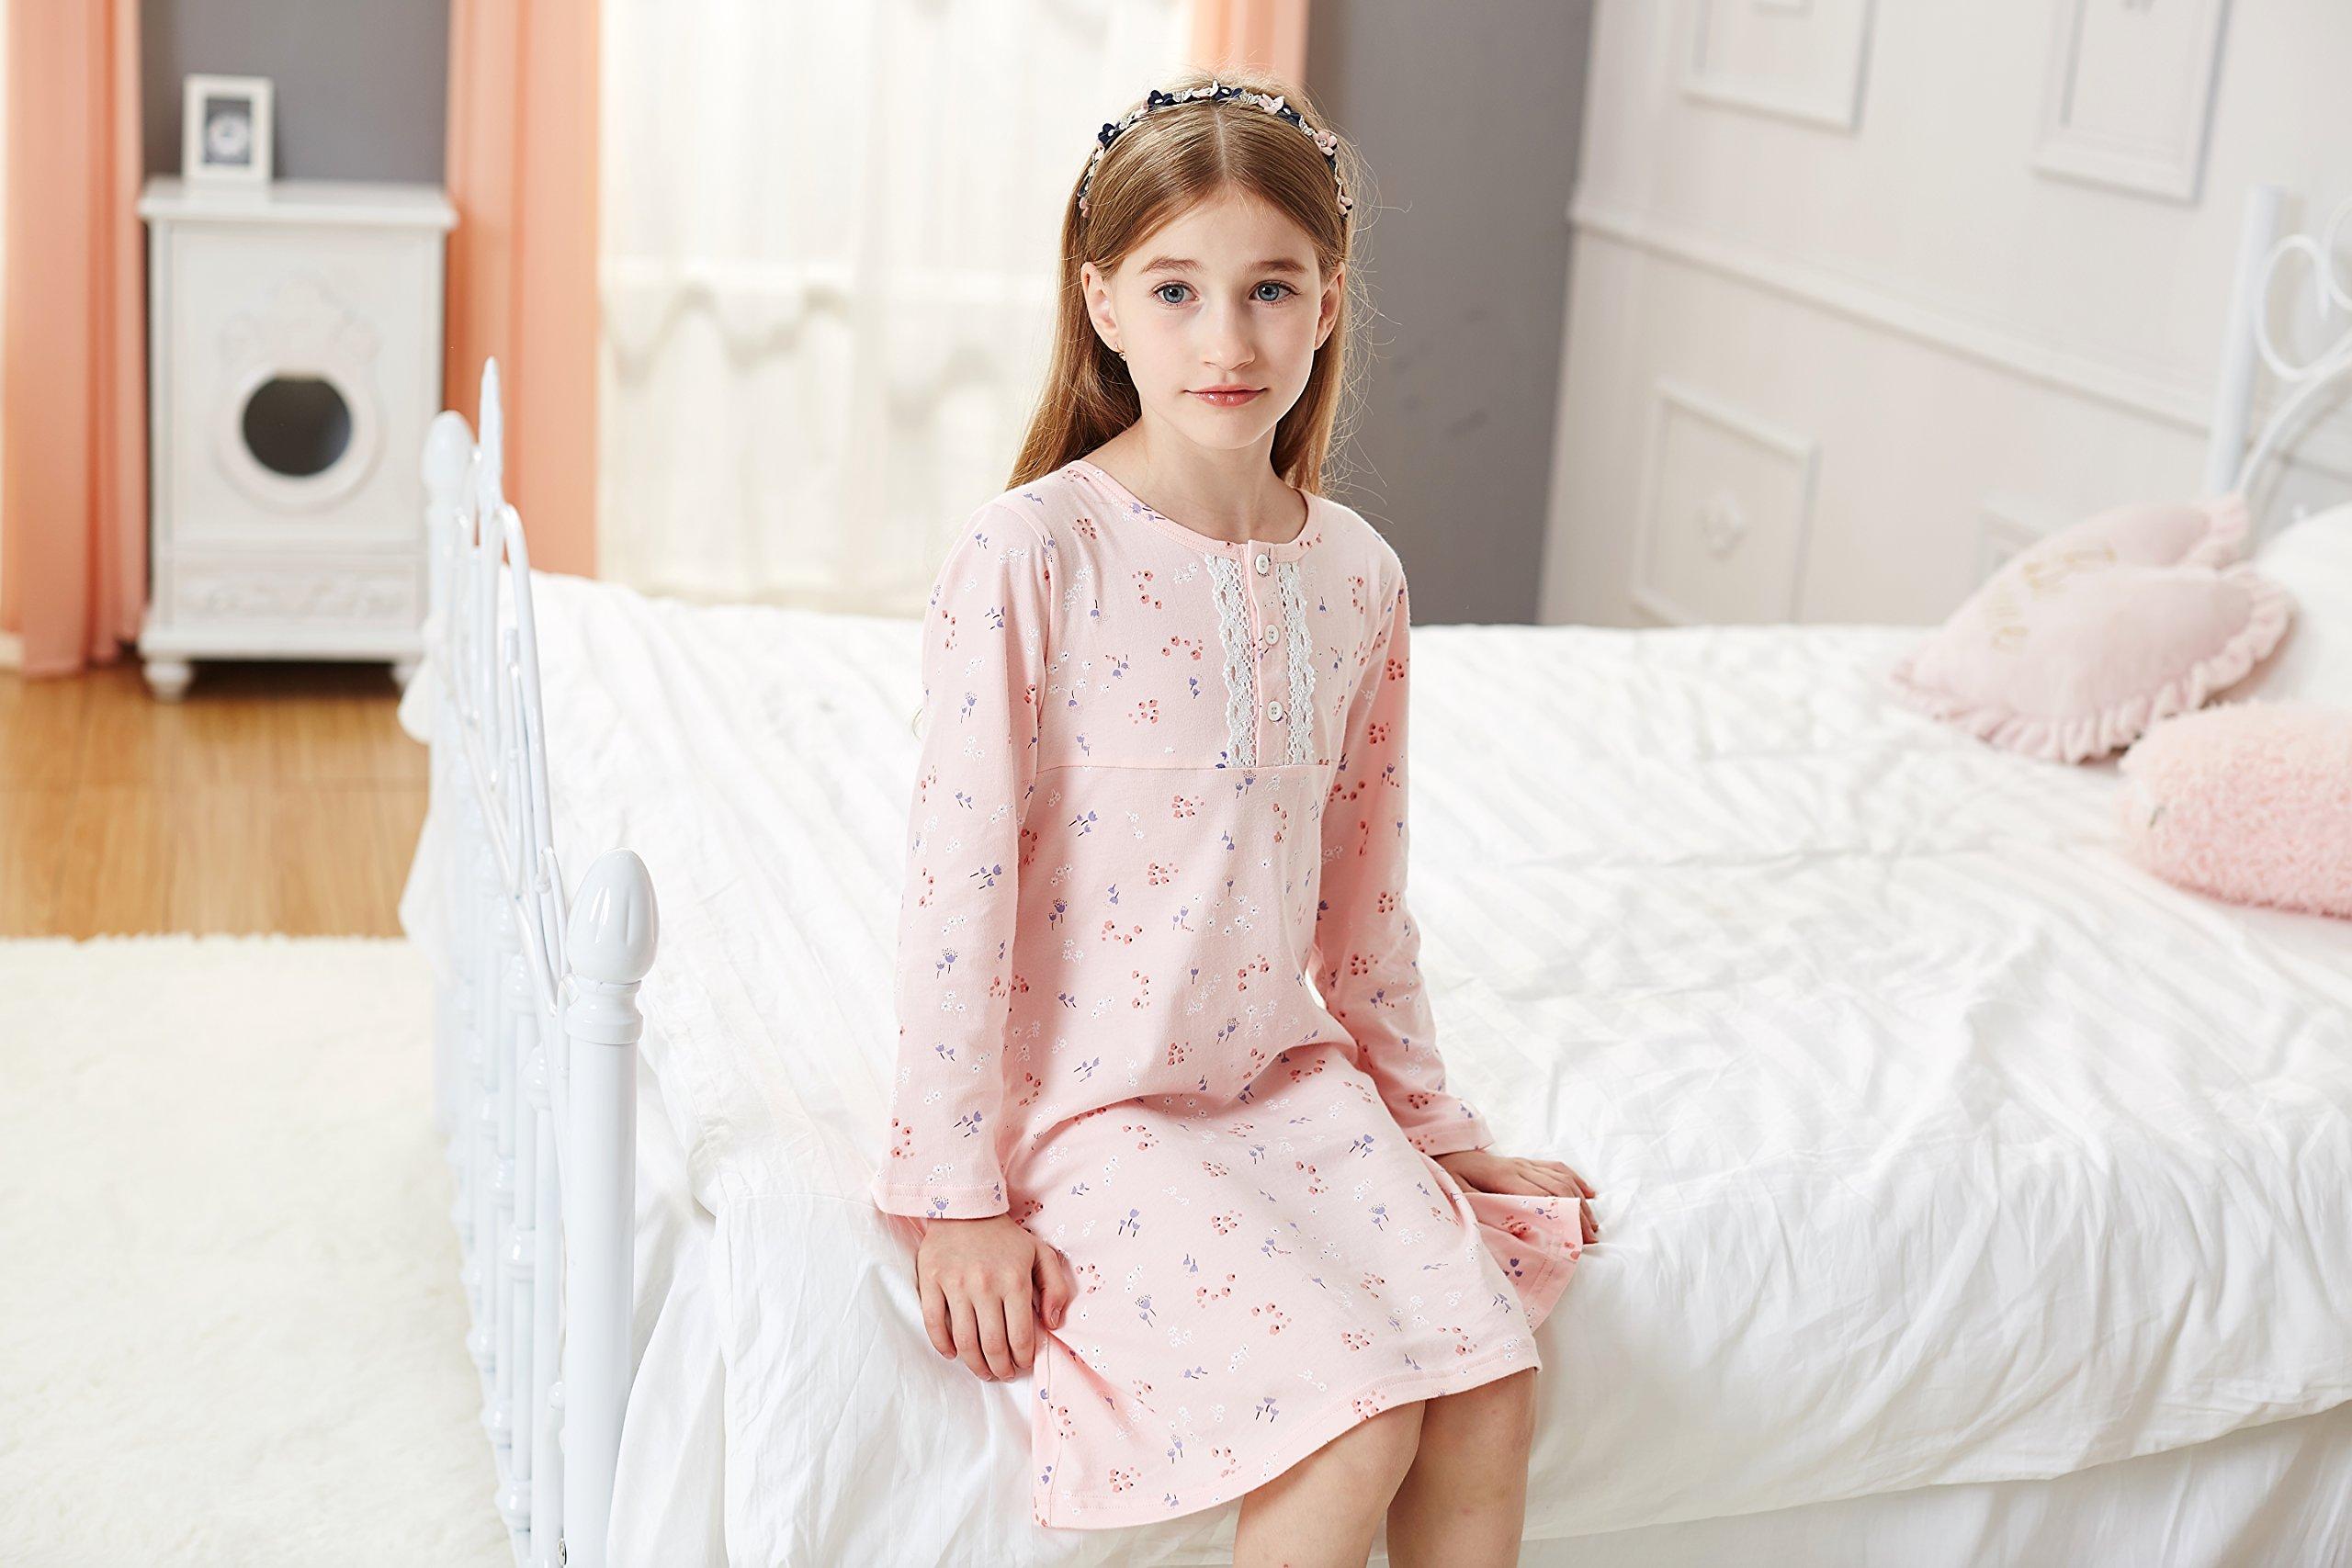 38698862b887 Allmeingeld Girls  Princess Nightgowns Lace Sleep Shirts 100% Cotton  Sleepwear for 3-10 Years (6-7 Years